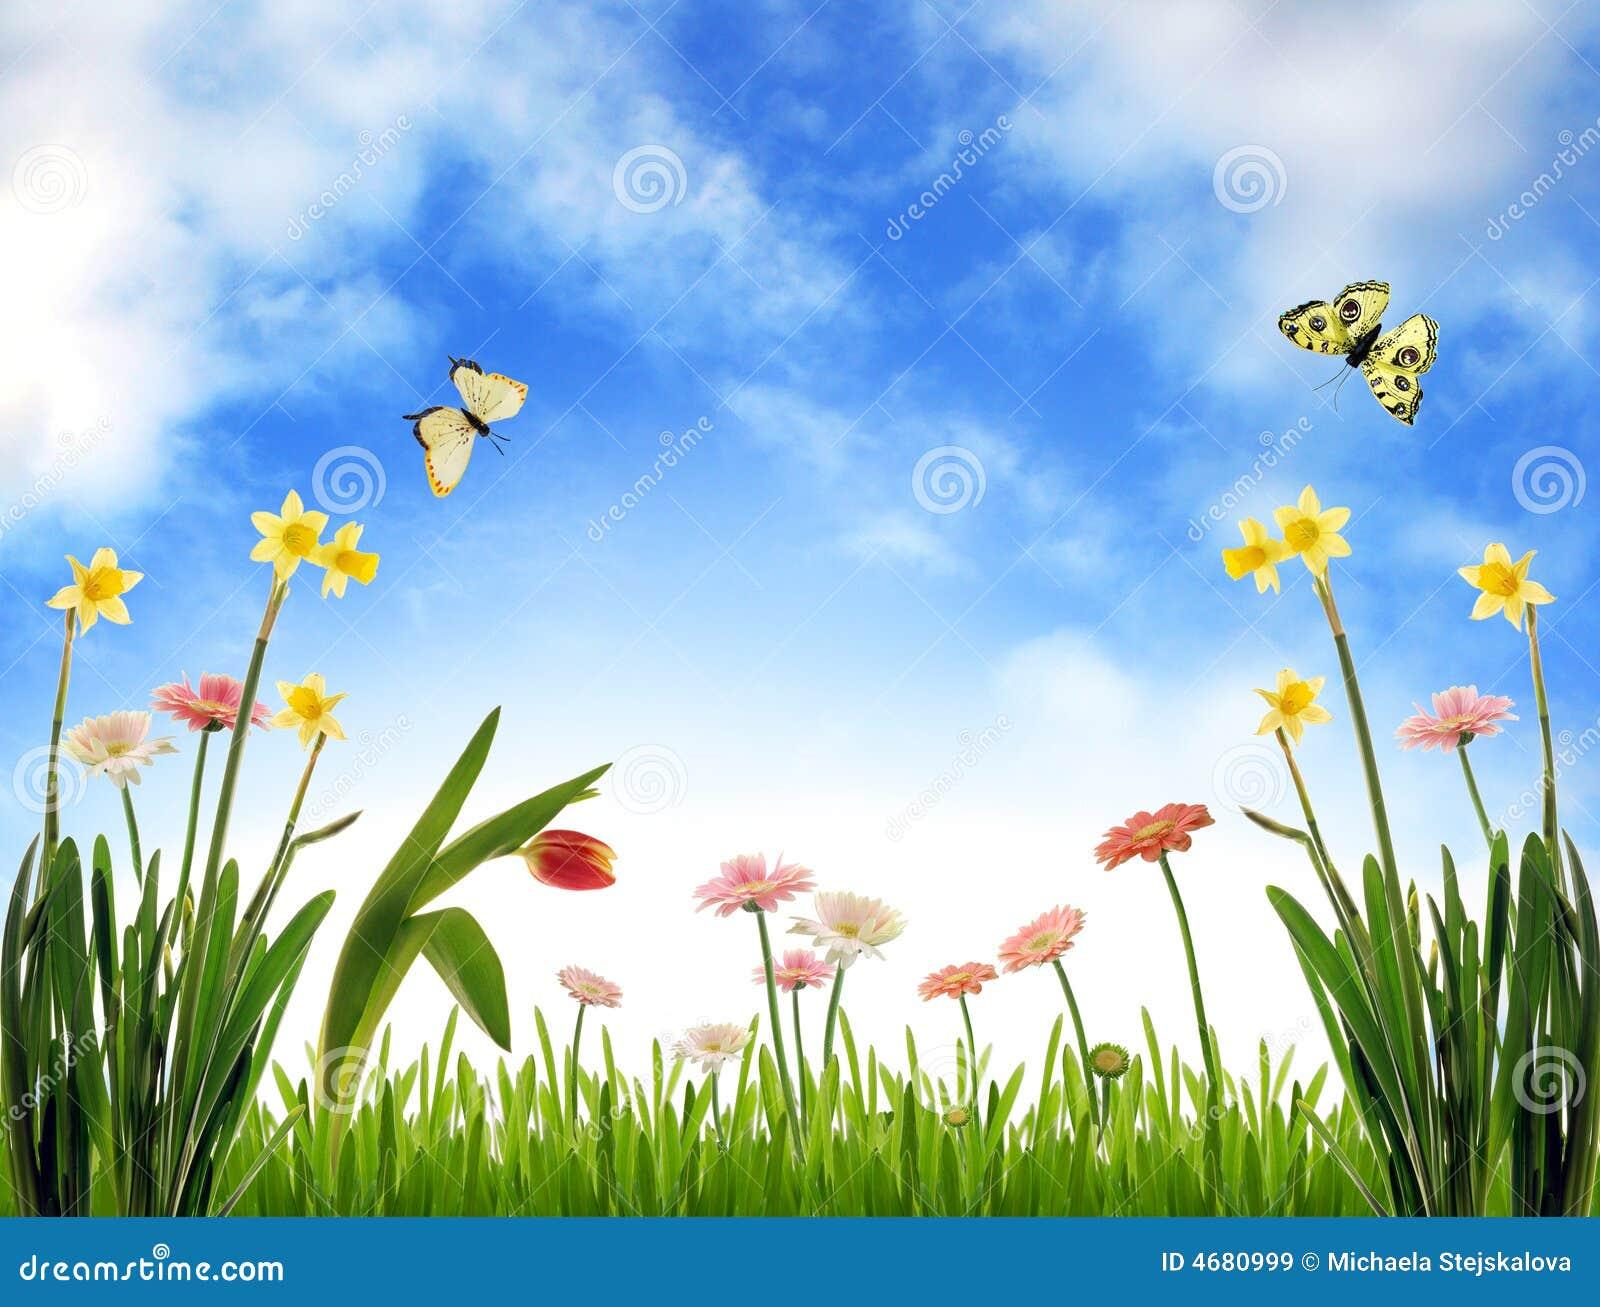 Idyllic spring scenery